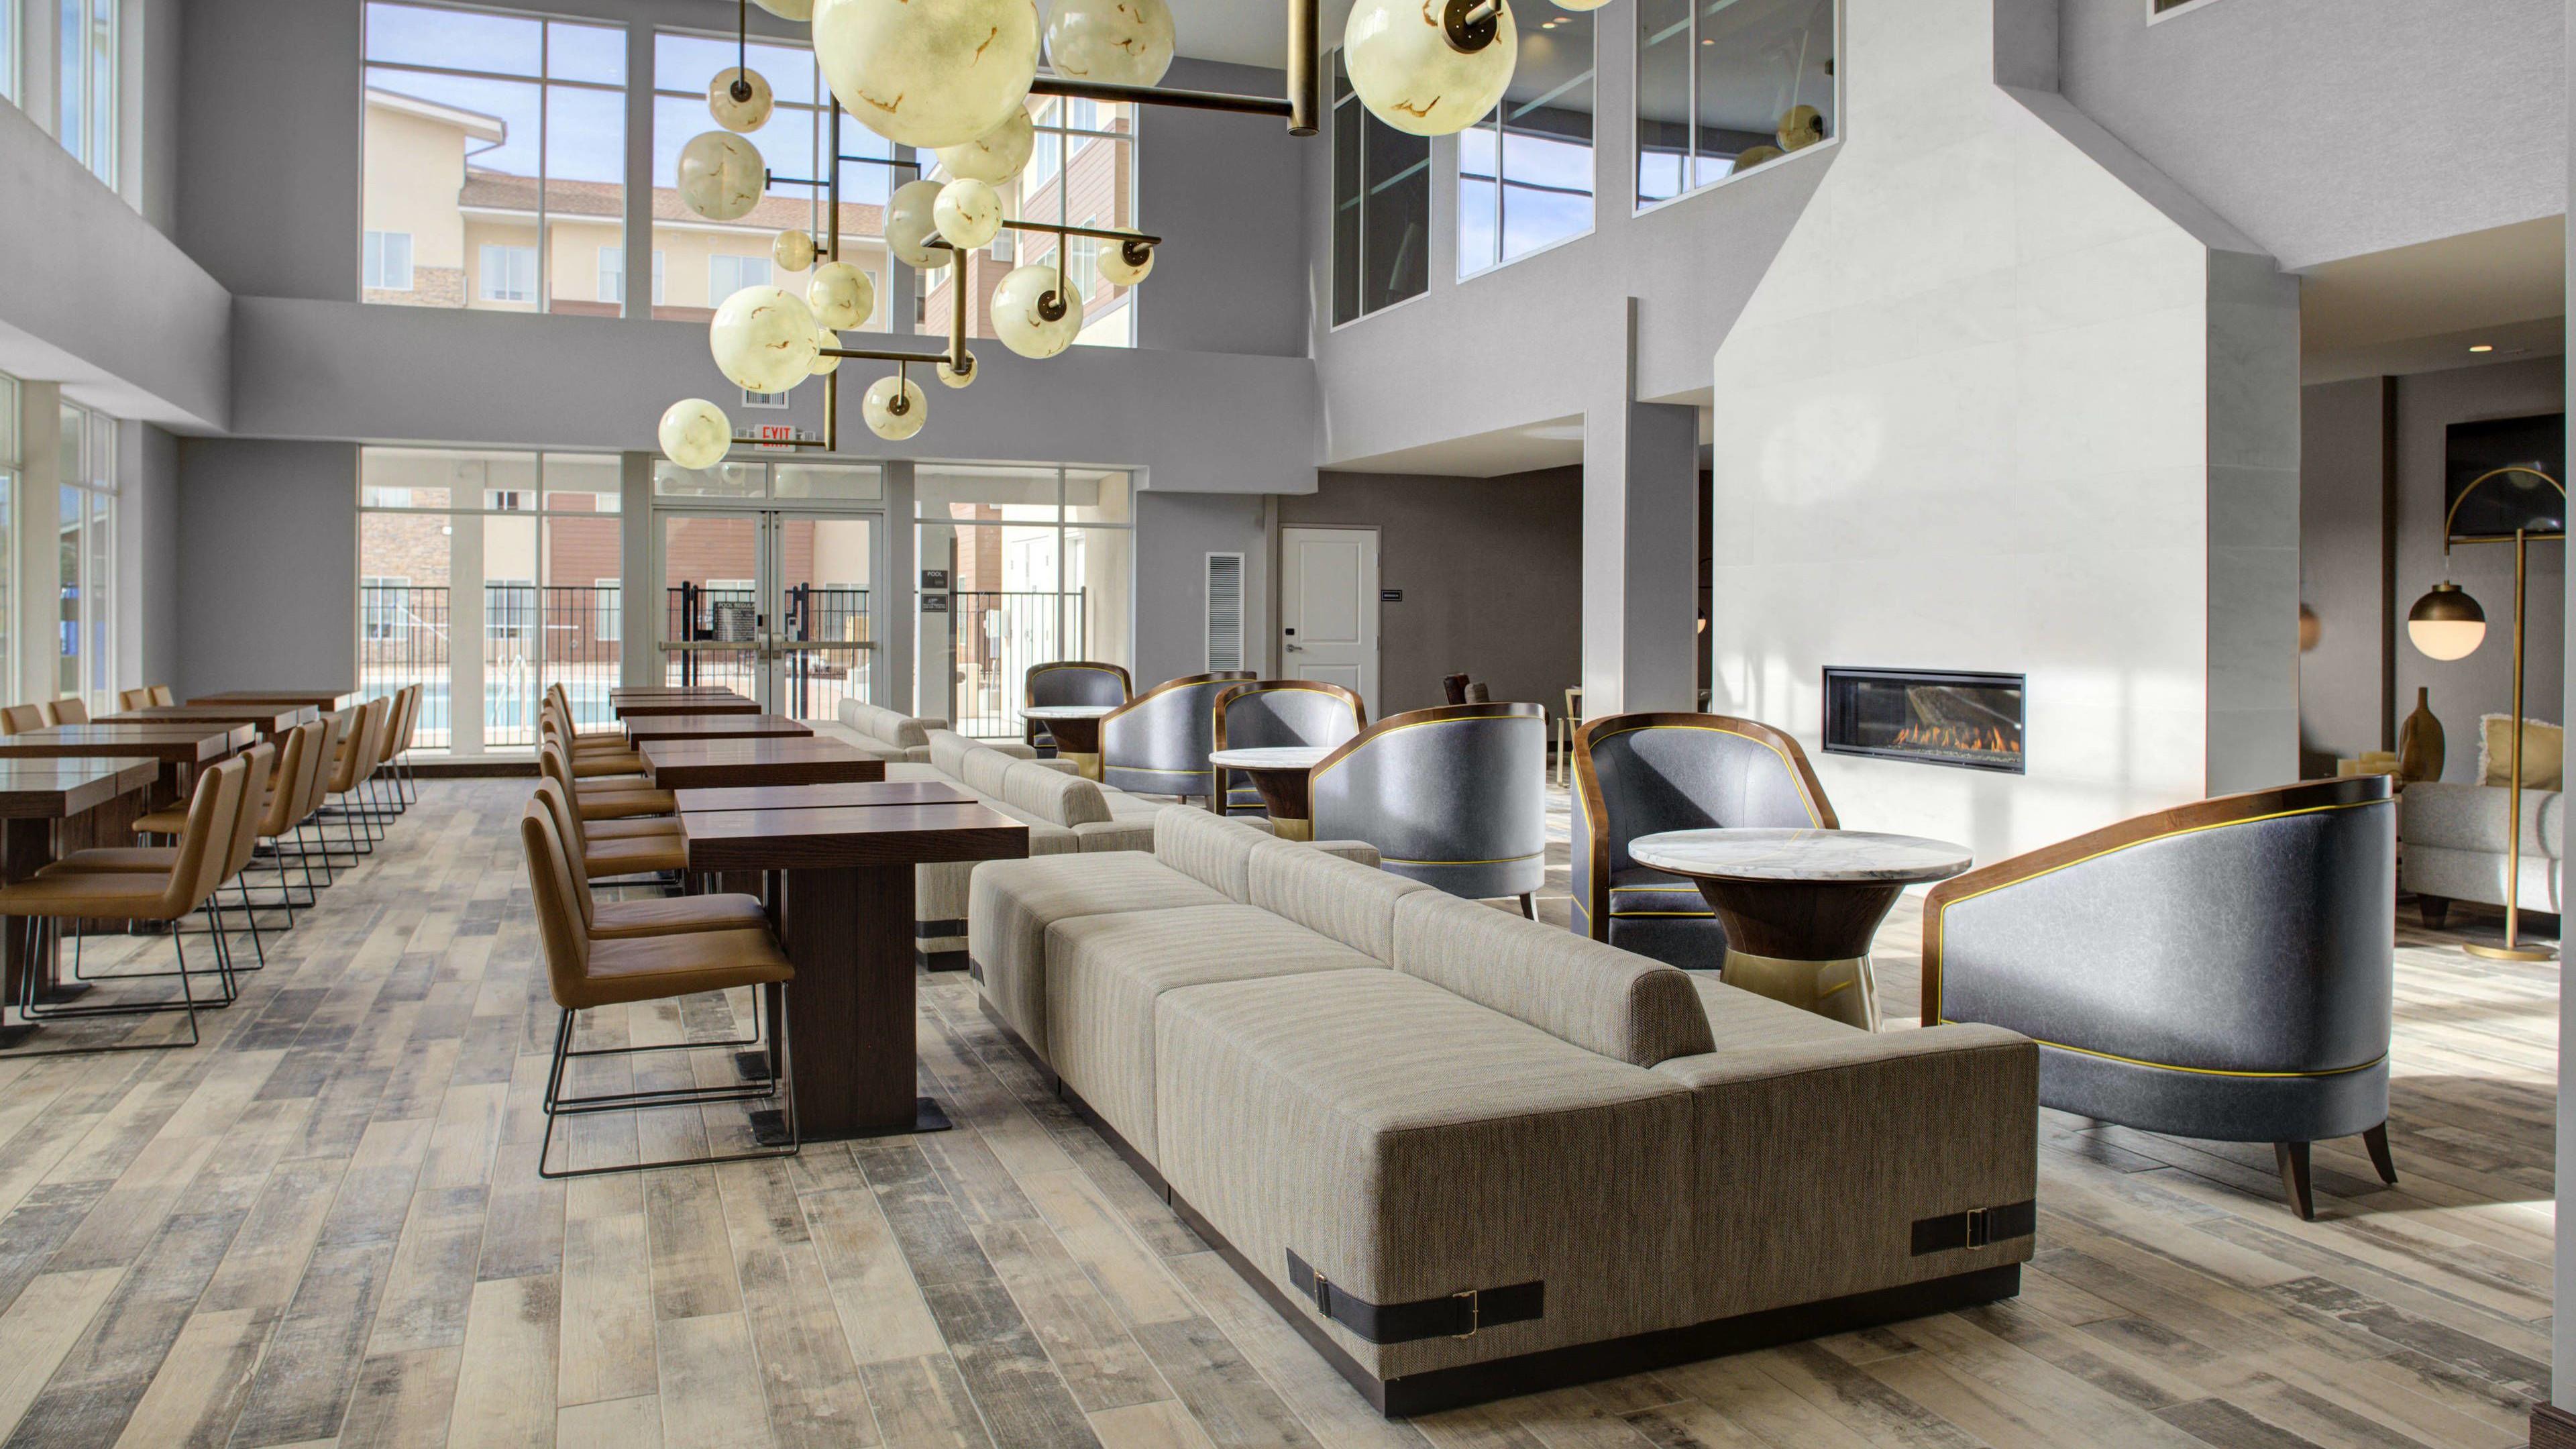 Courtesy of Residence Inn by Marriott Boulder Broomfield / Expedia